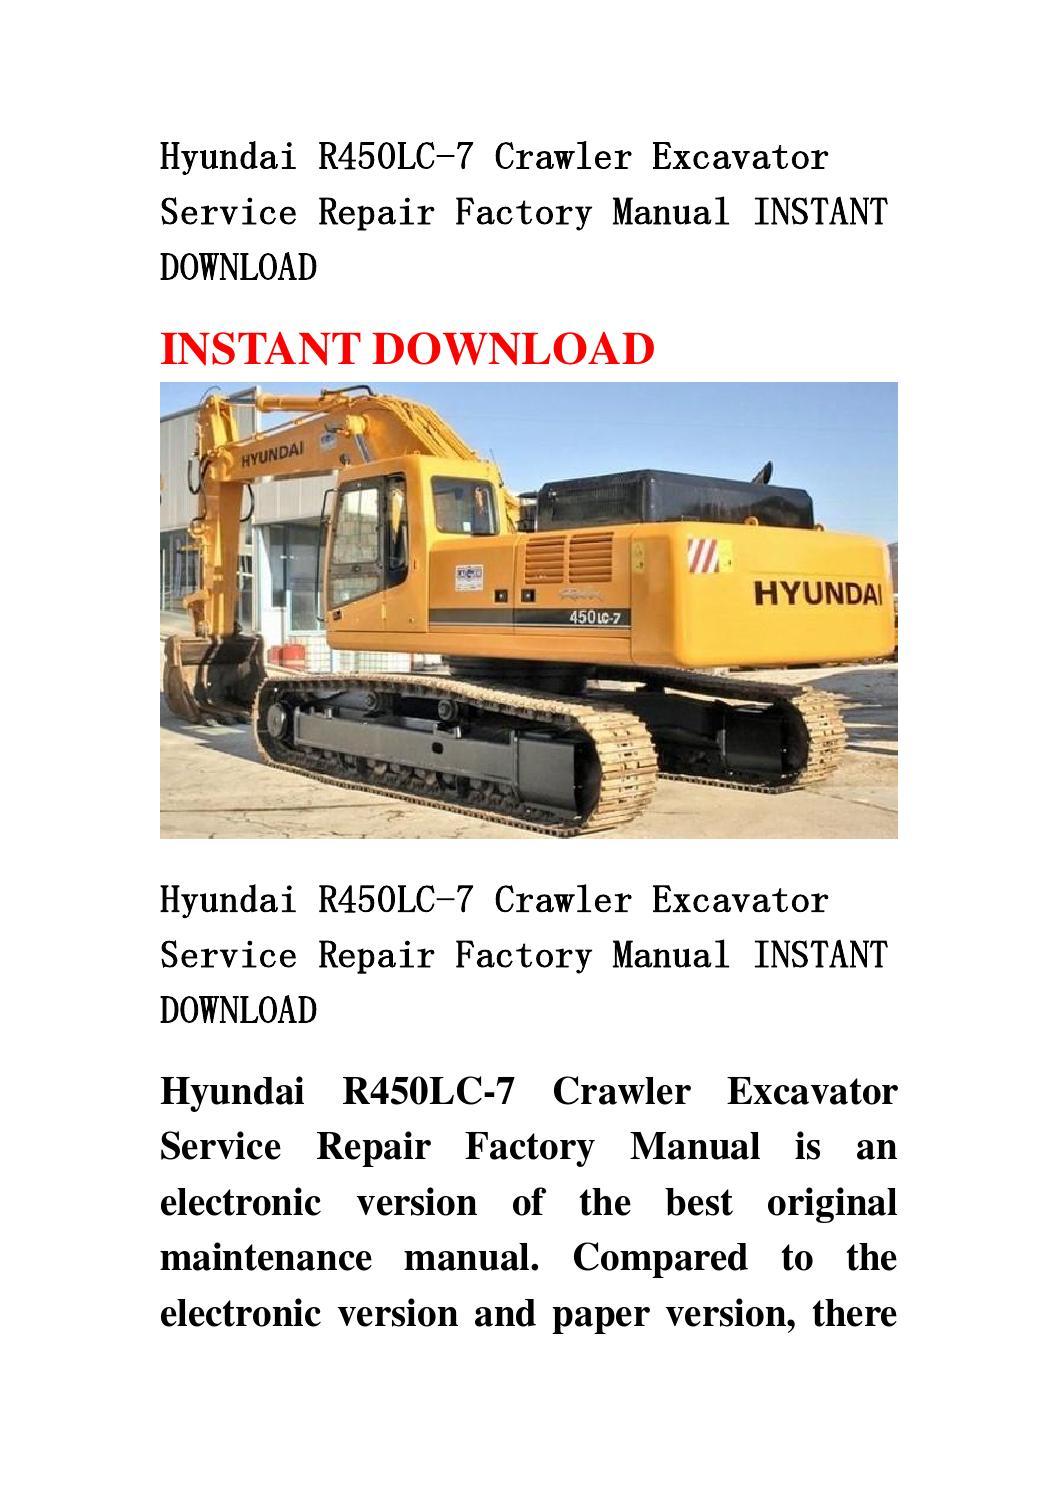 hyundai r450lc 7 crawler excavator service repair factory